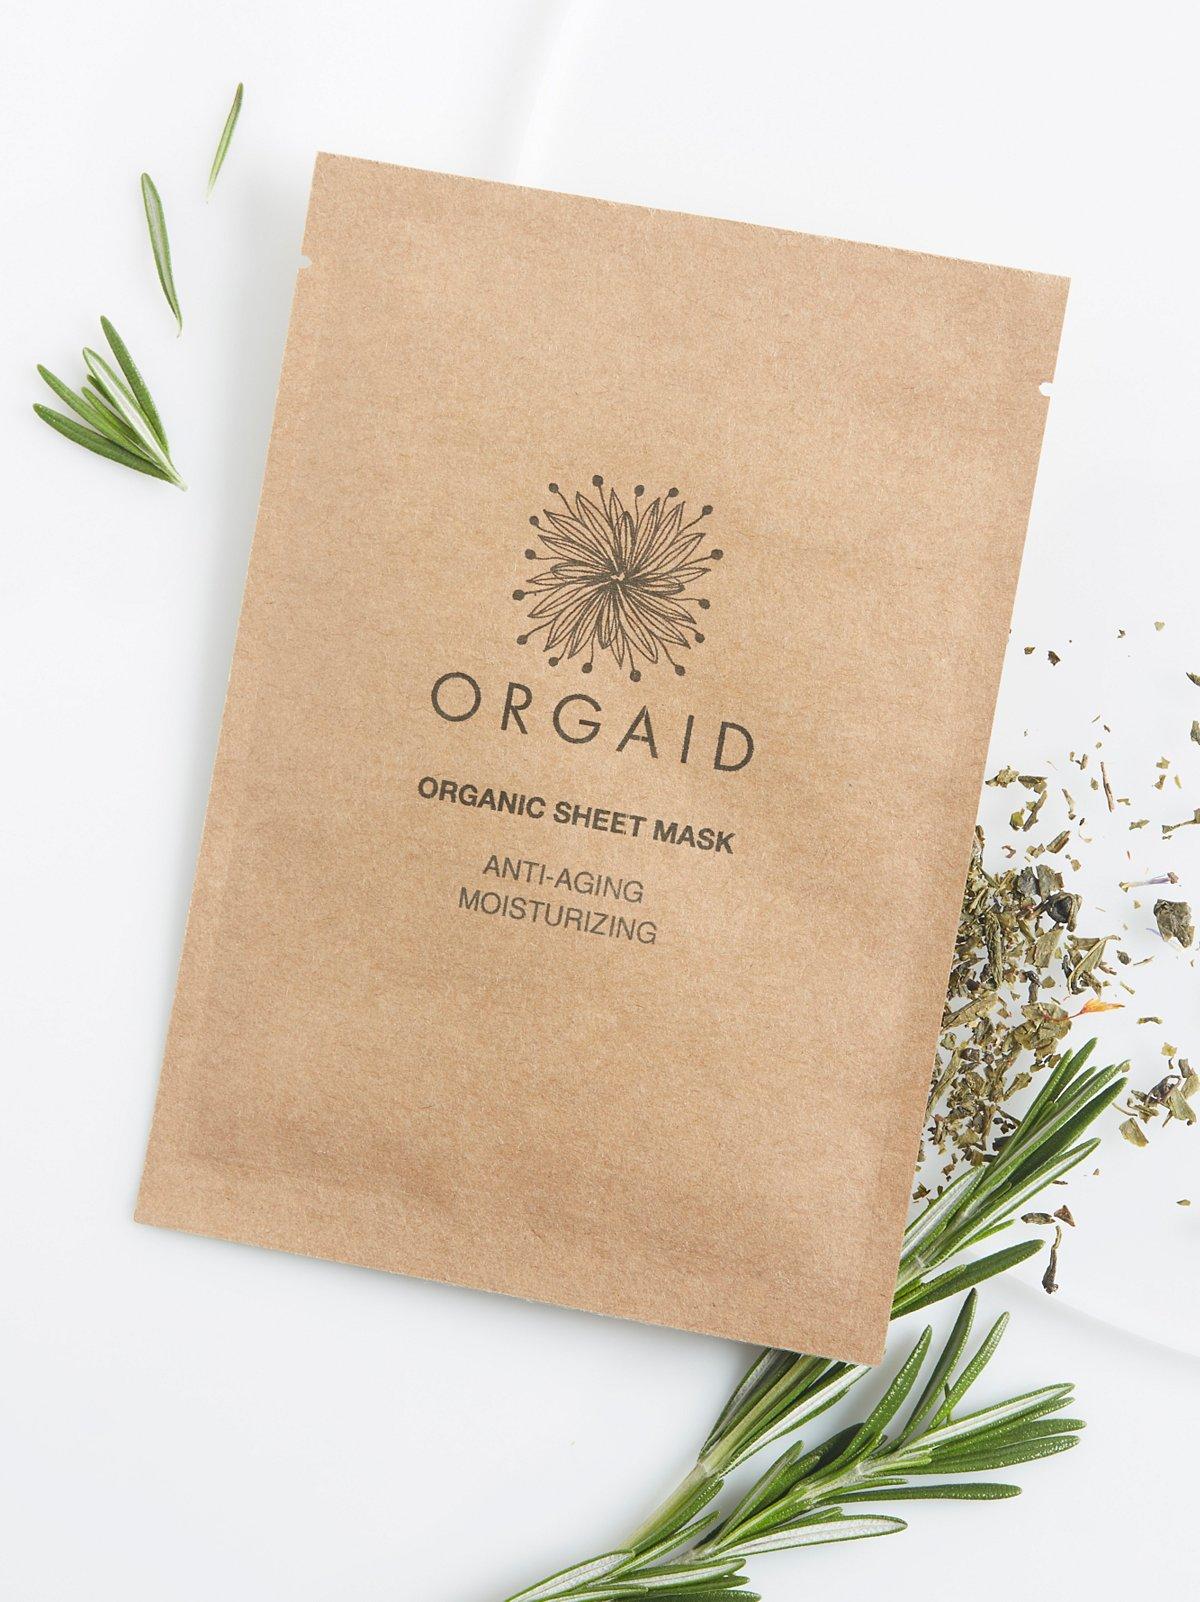 Antiaging & Moisturizing Organic Mask